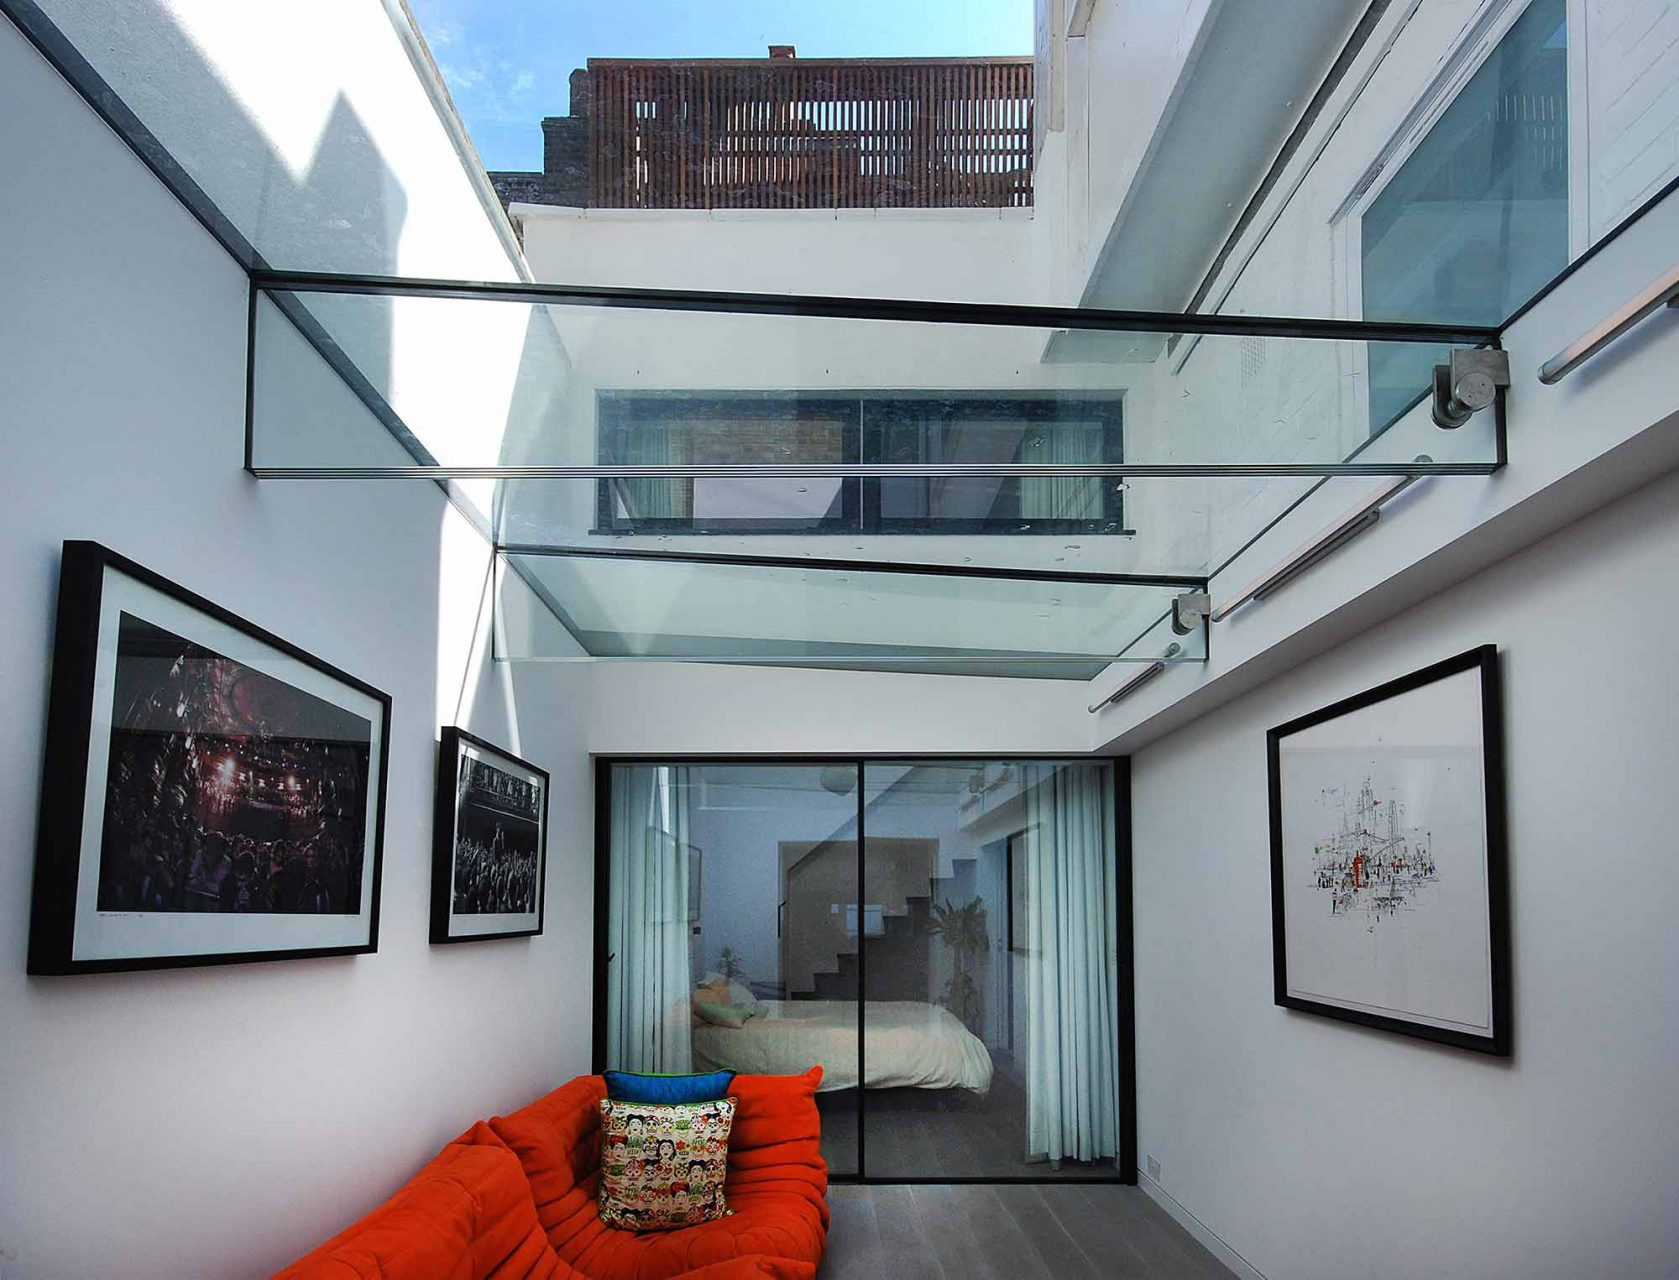 Guttfield-Islington-basement-InsideGarden